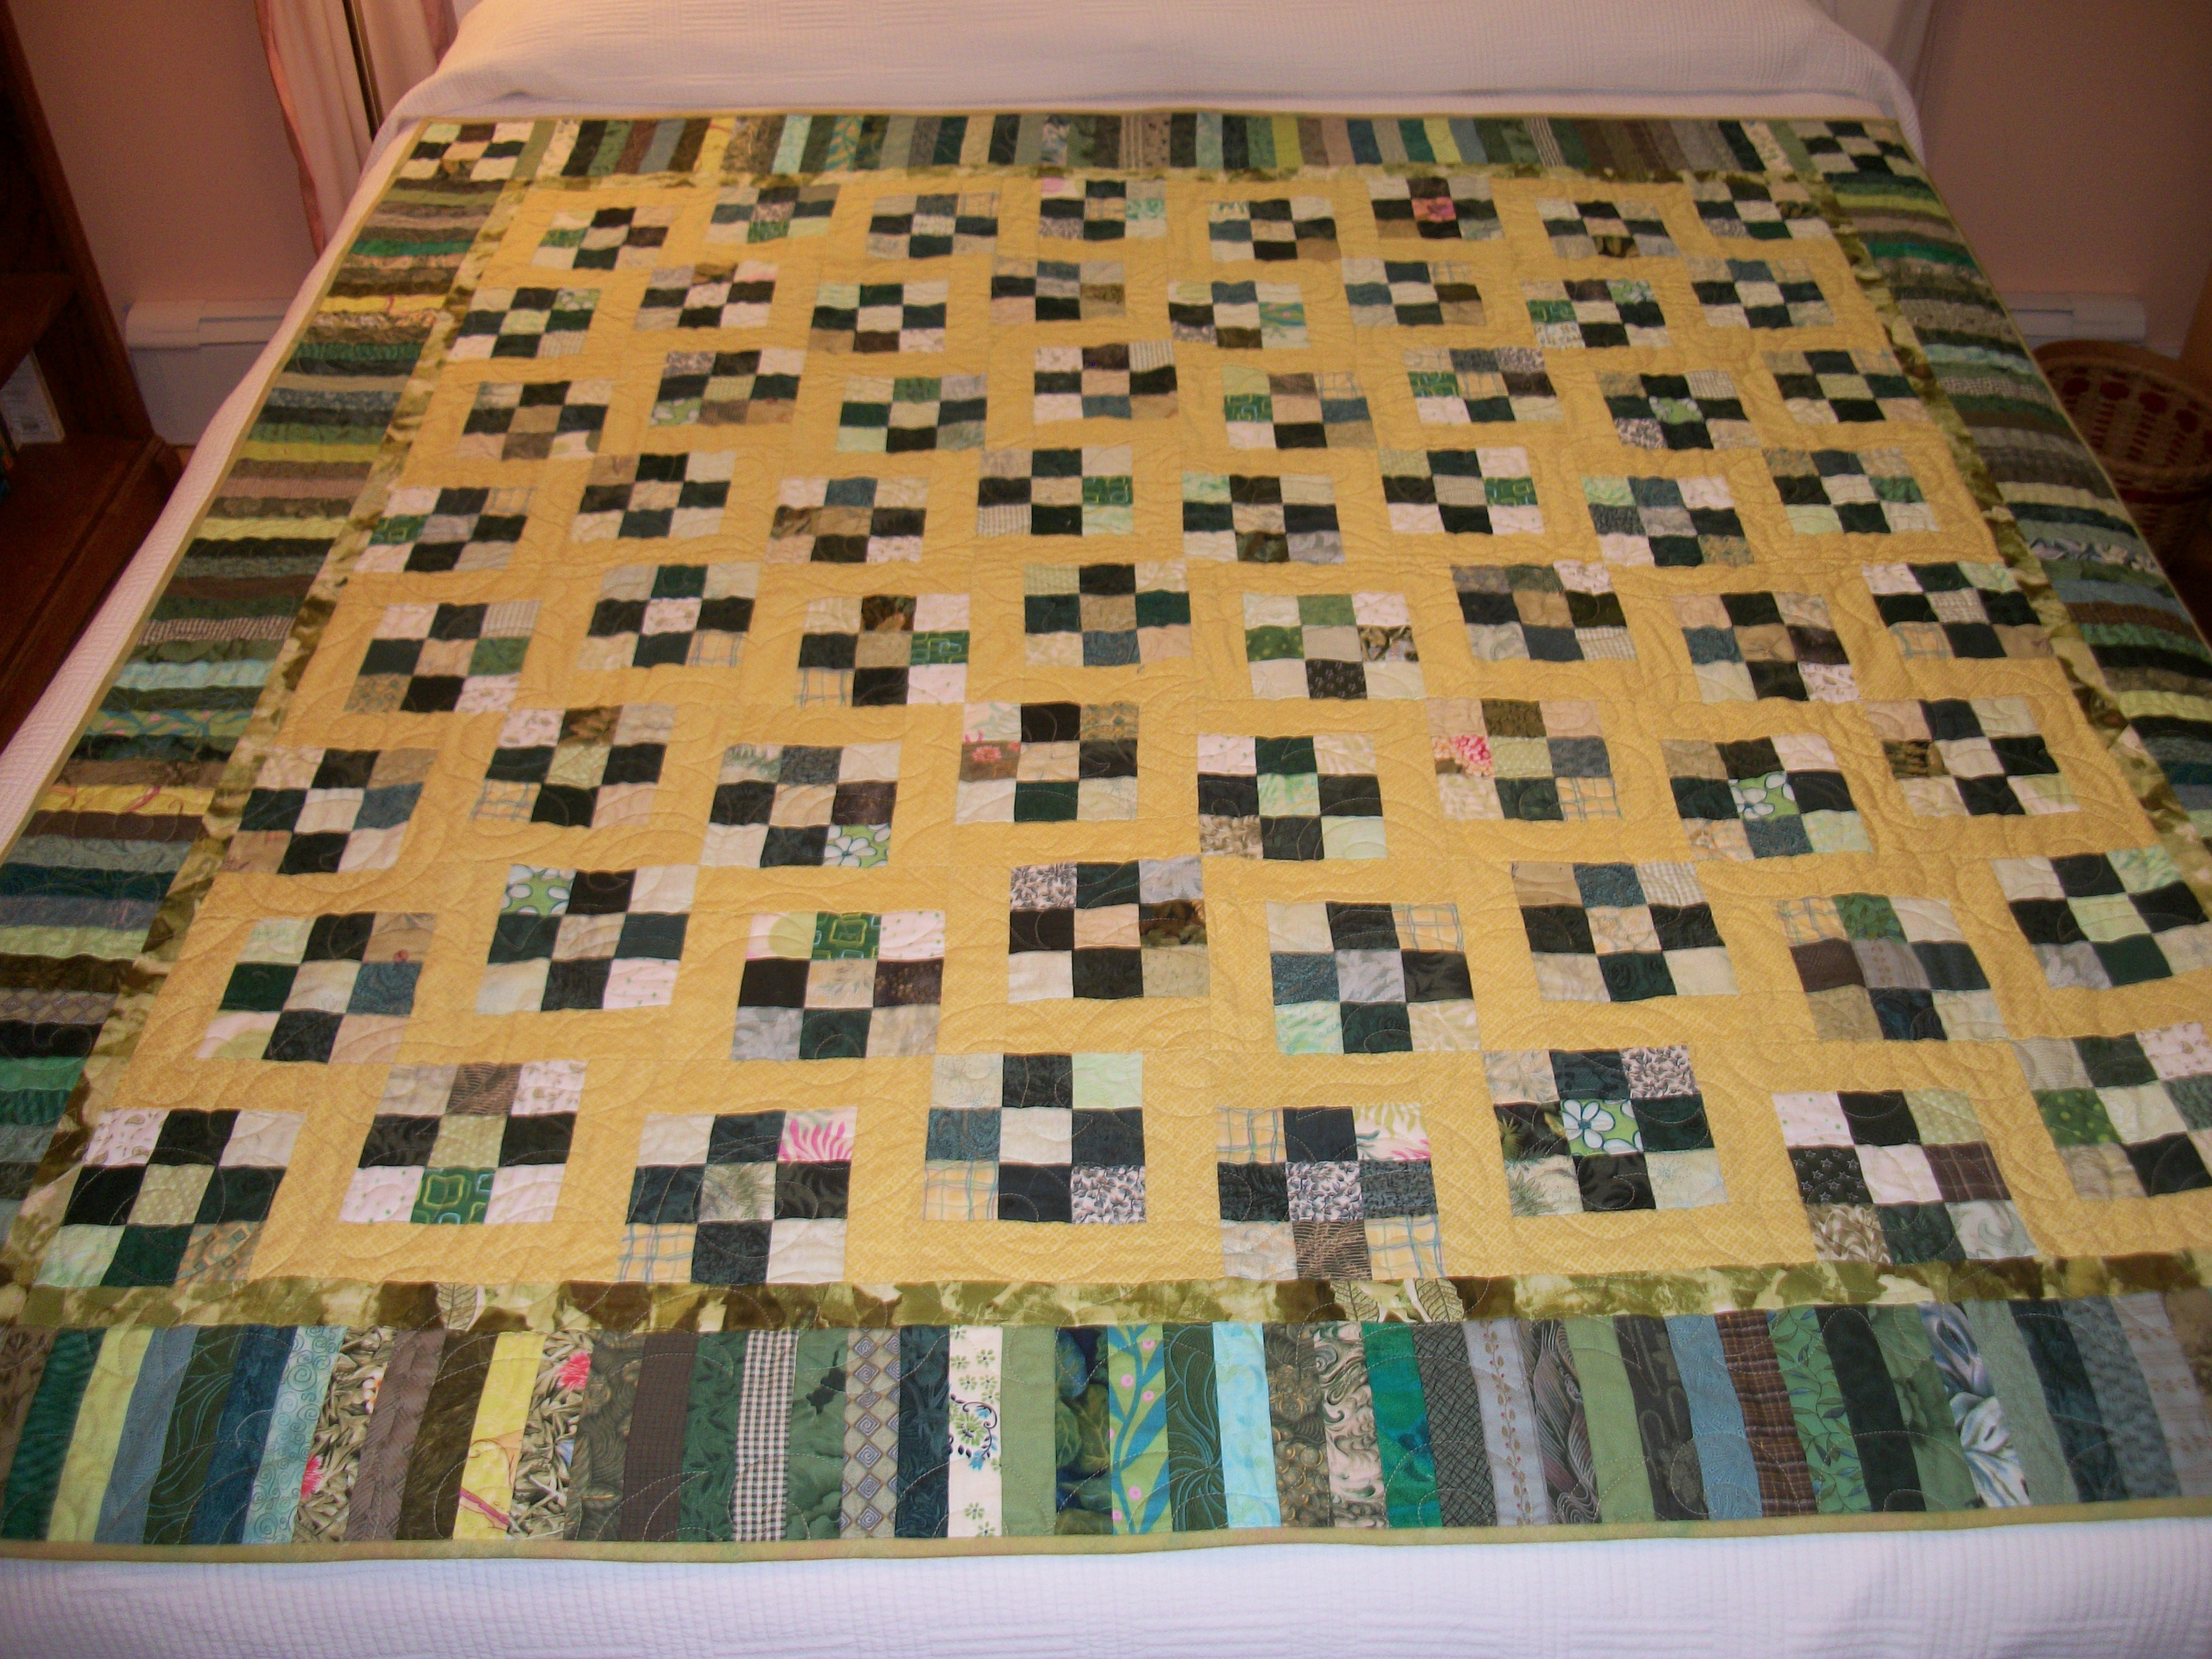 Sunshine and Shadows quilt | Louisa Enright's Blog : piano key quilt border - Adamdwight.com